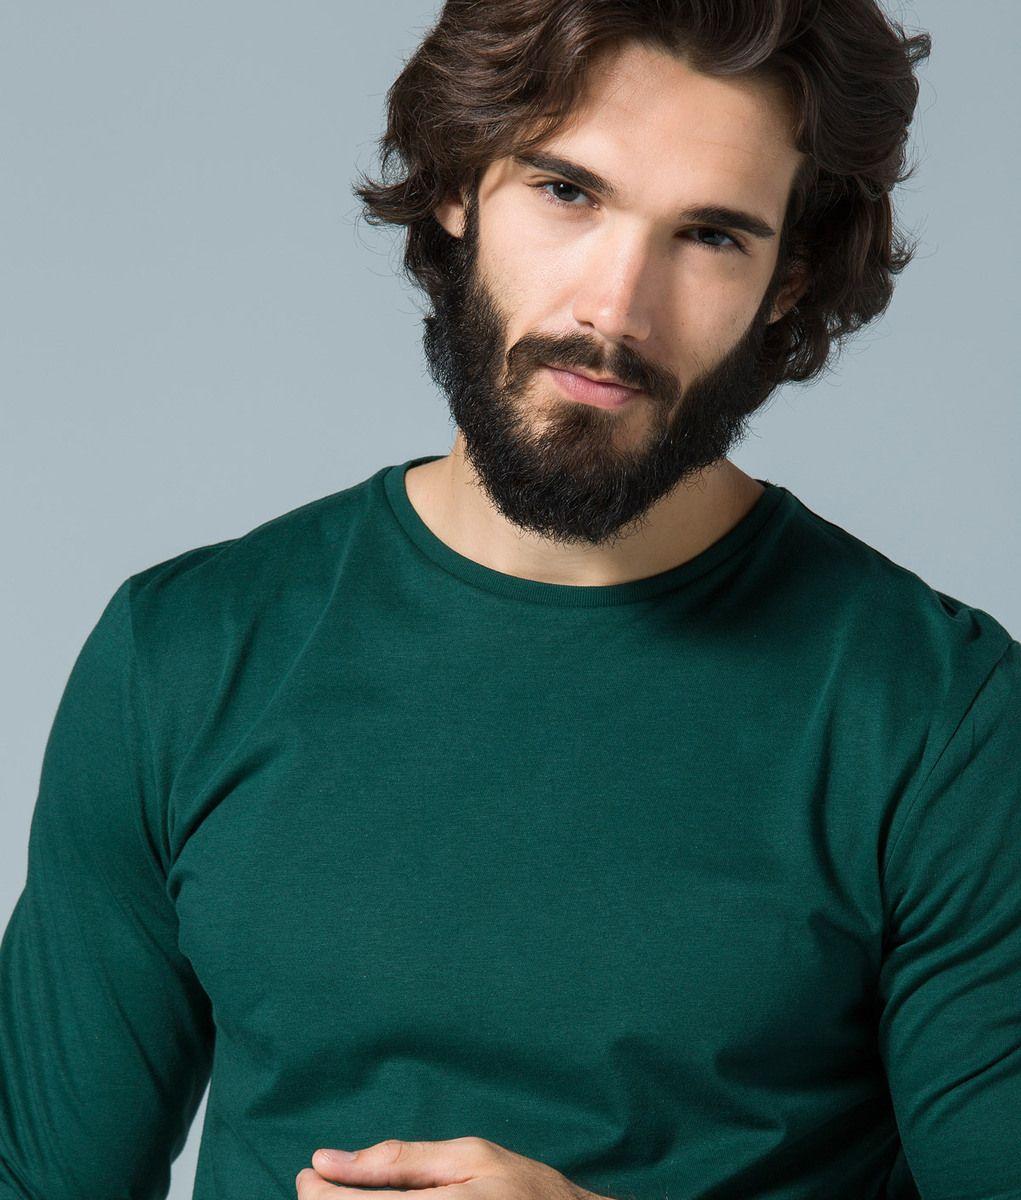 Pin By Sergio Garcia Serratos On Hair Beard Styles Curly Hair Men Beard Hairstyle